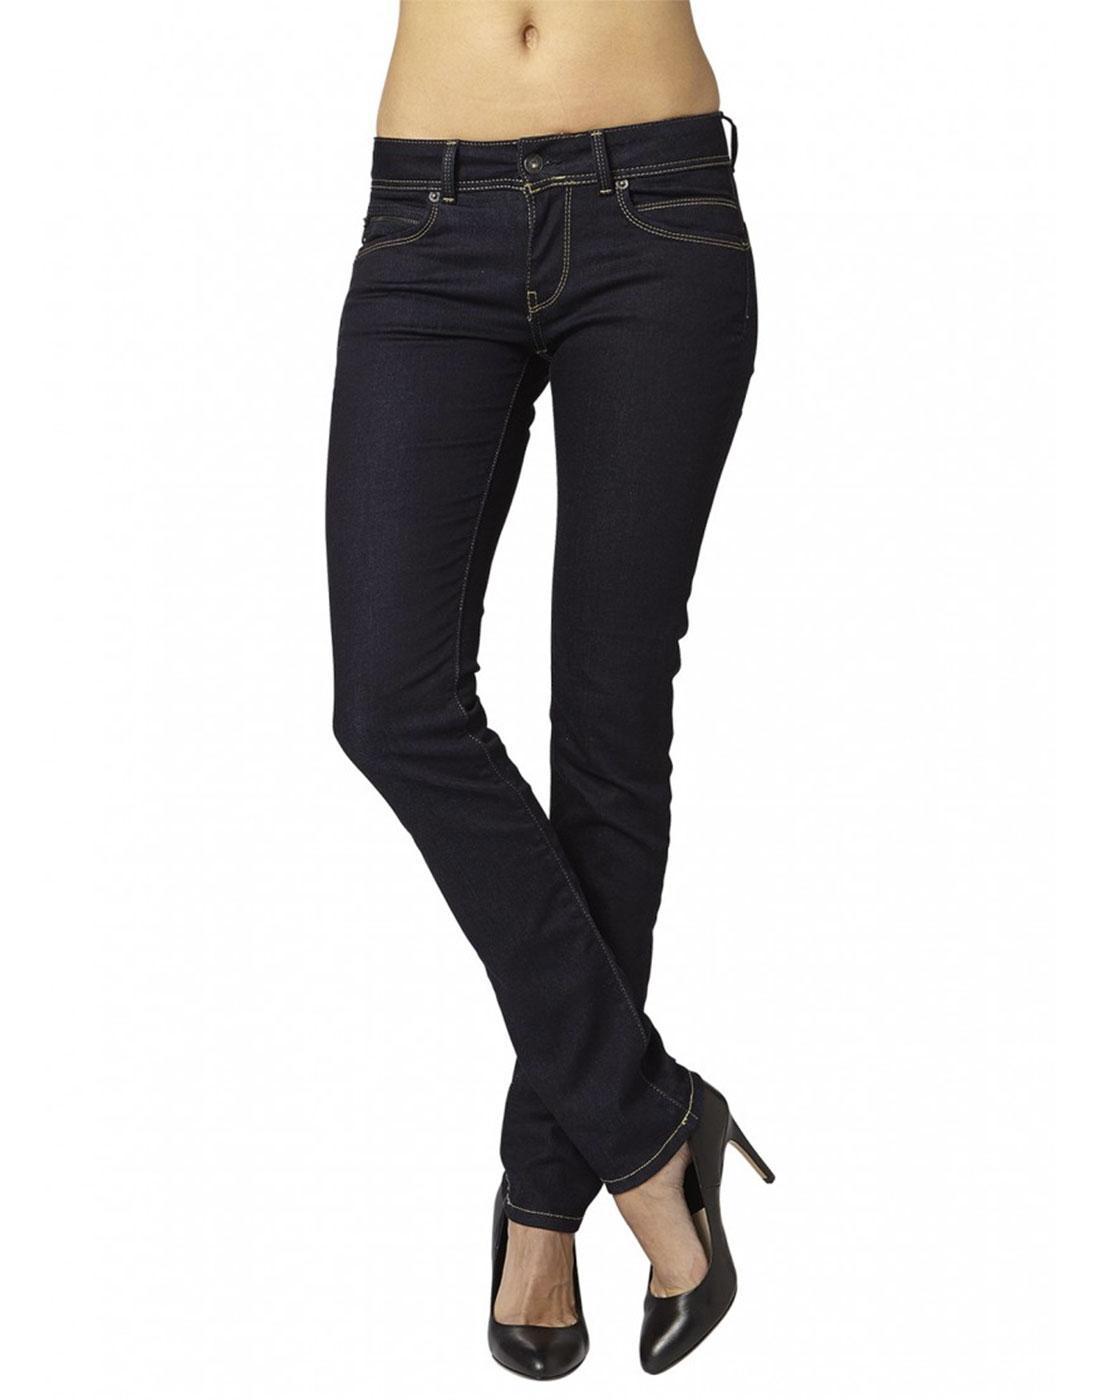 New Brooke PEPE JEANS Retro Rinse Denim Slim Jeans